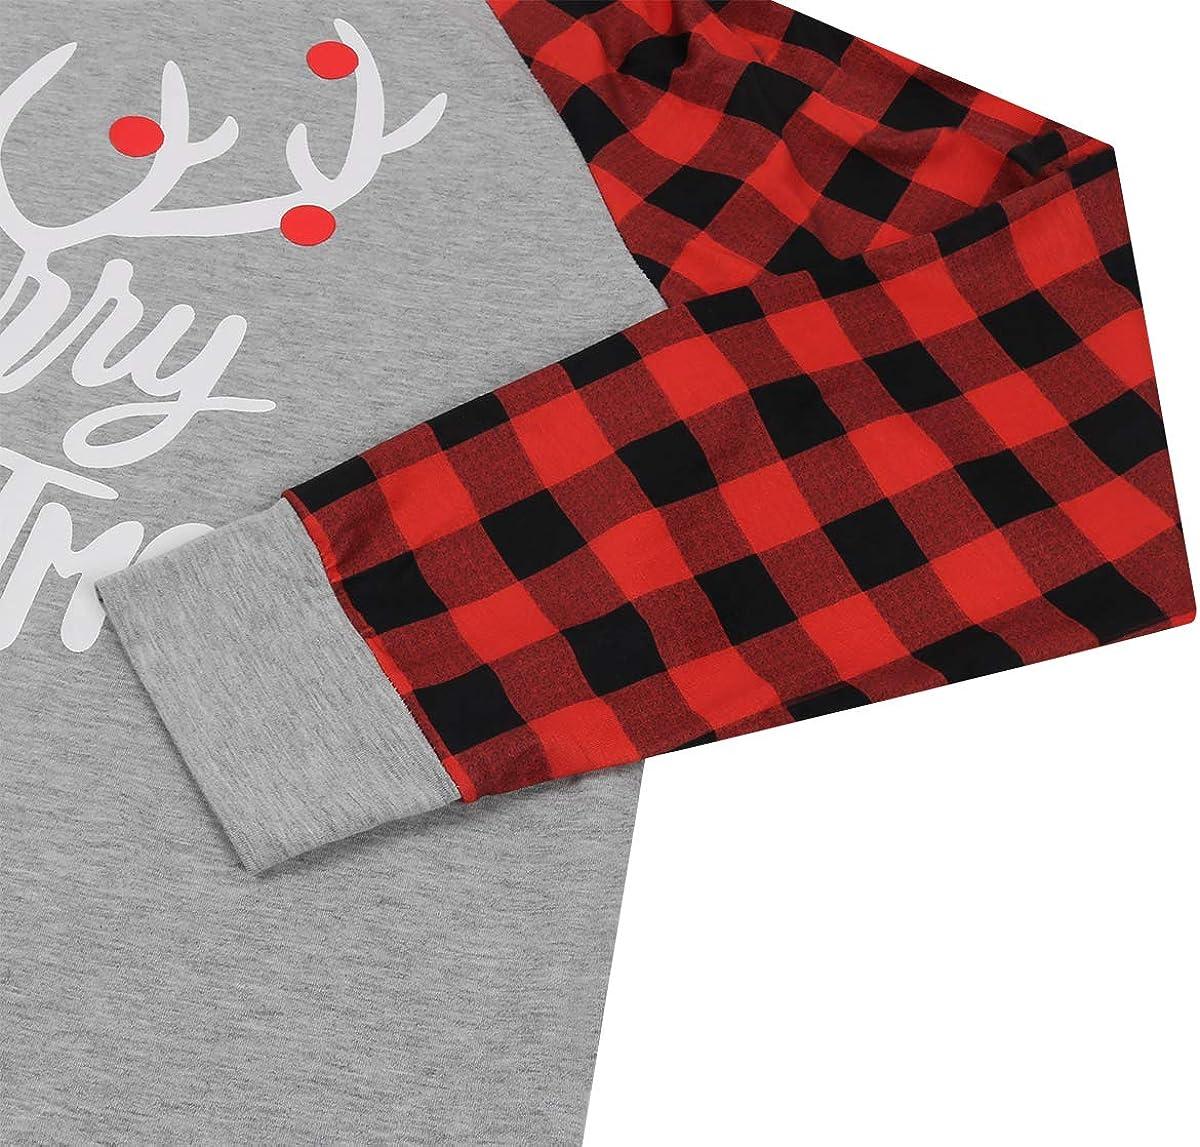 Merry Christmas Truck Tree Graphic Cute Shirt Womens Plaid Splicing Long Sleeve Raglan Tees Baseball Tops